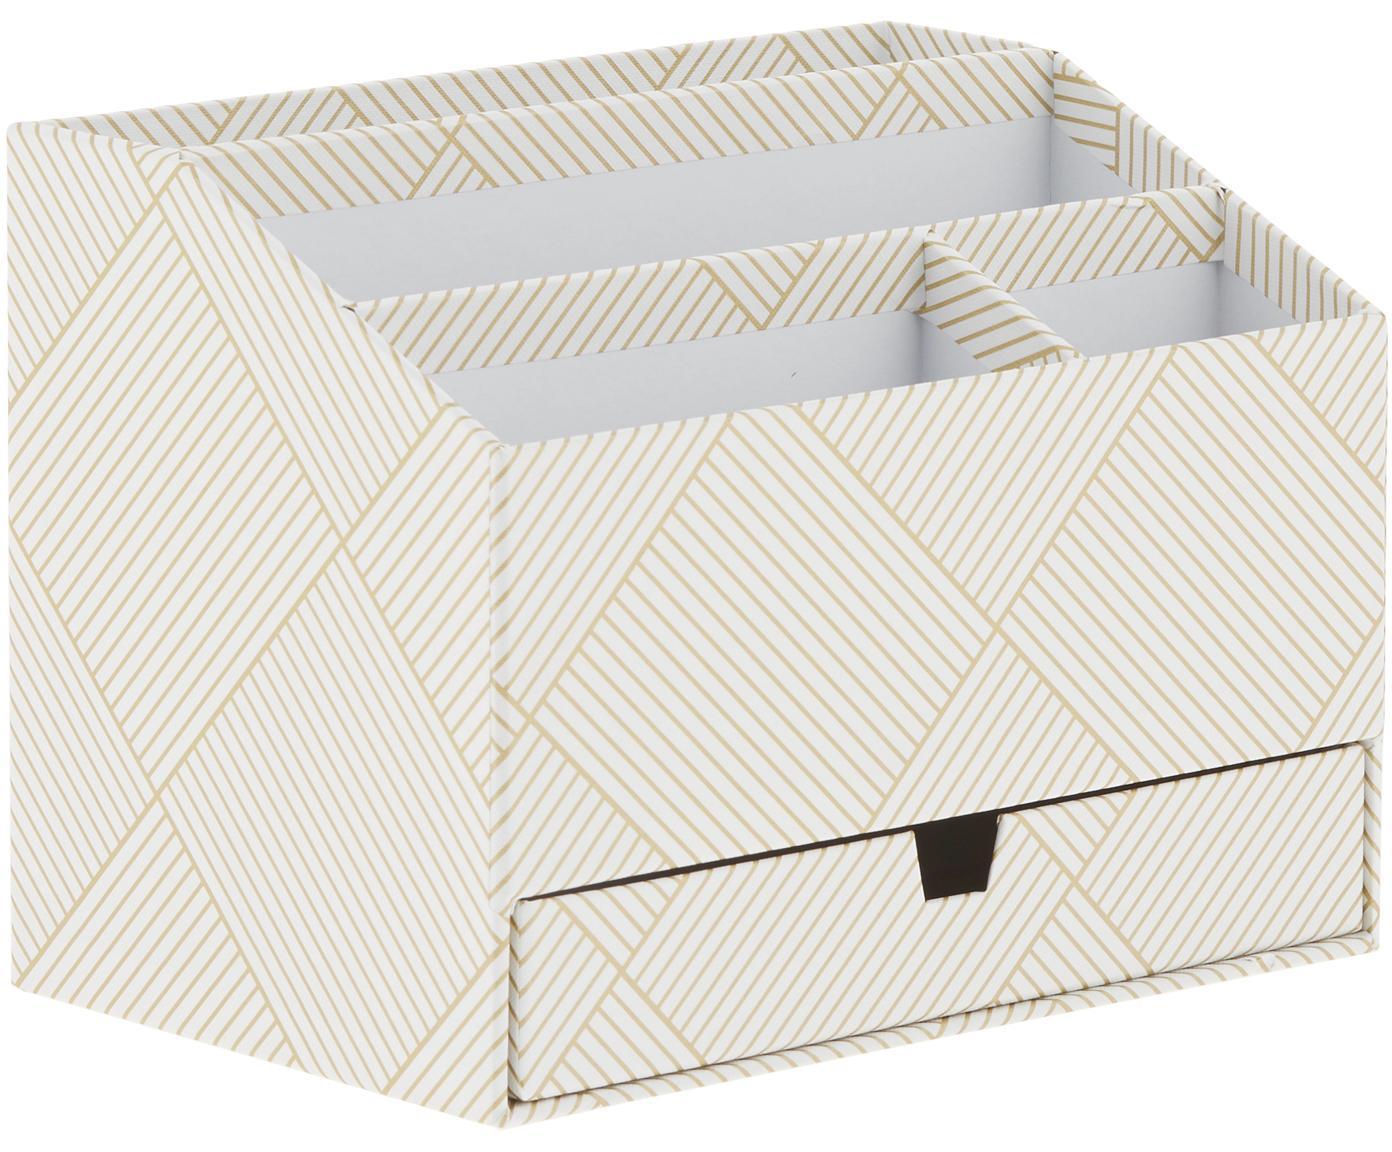 Büro-Organizer Greta, Fester, laminierter Karton, Goldfarben, Weiß, 24 x 18 cm